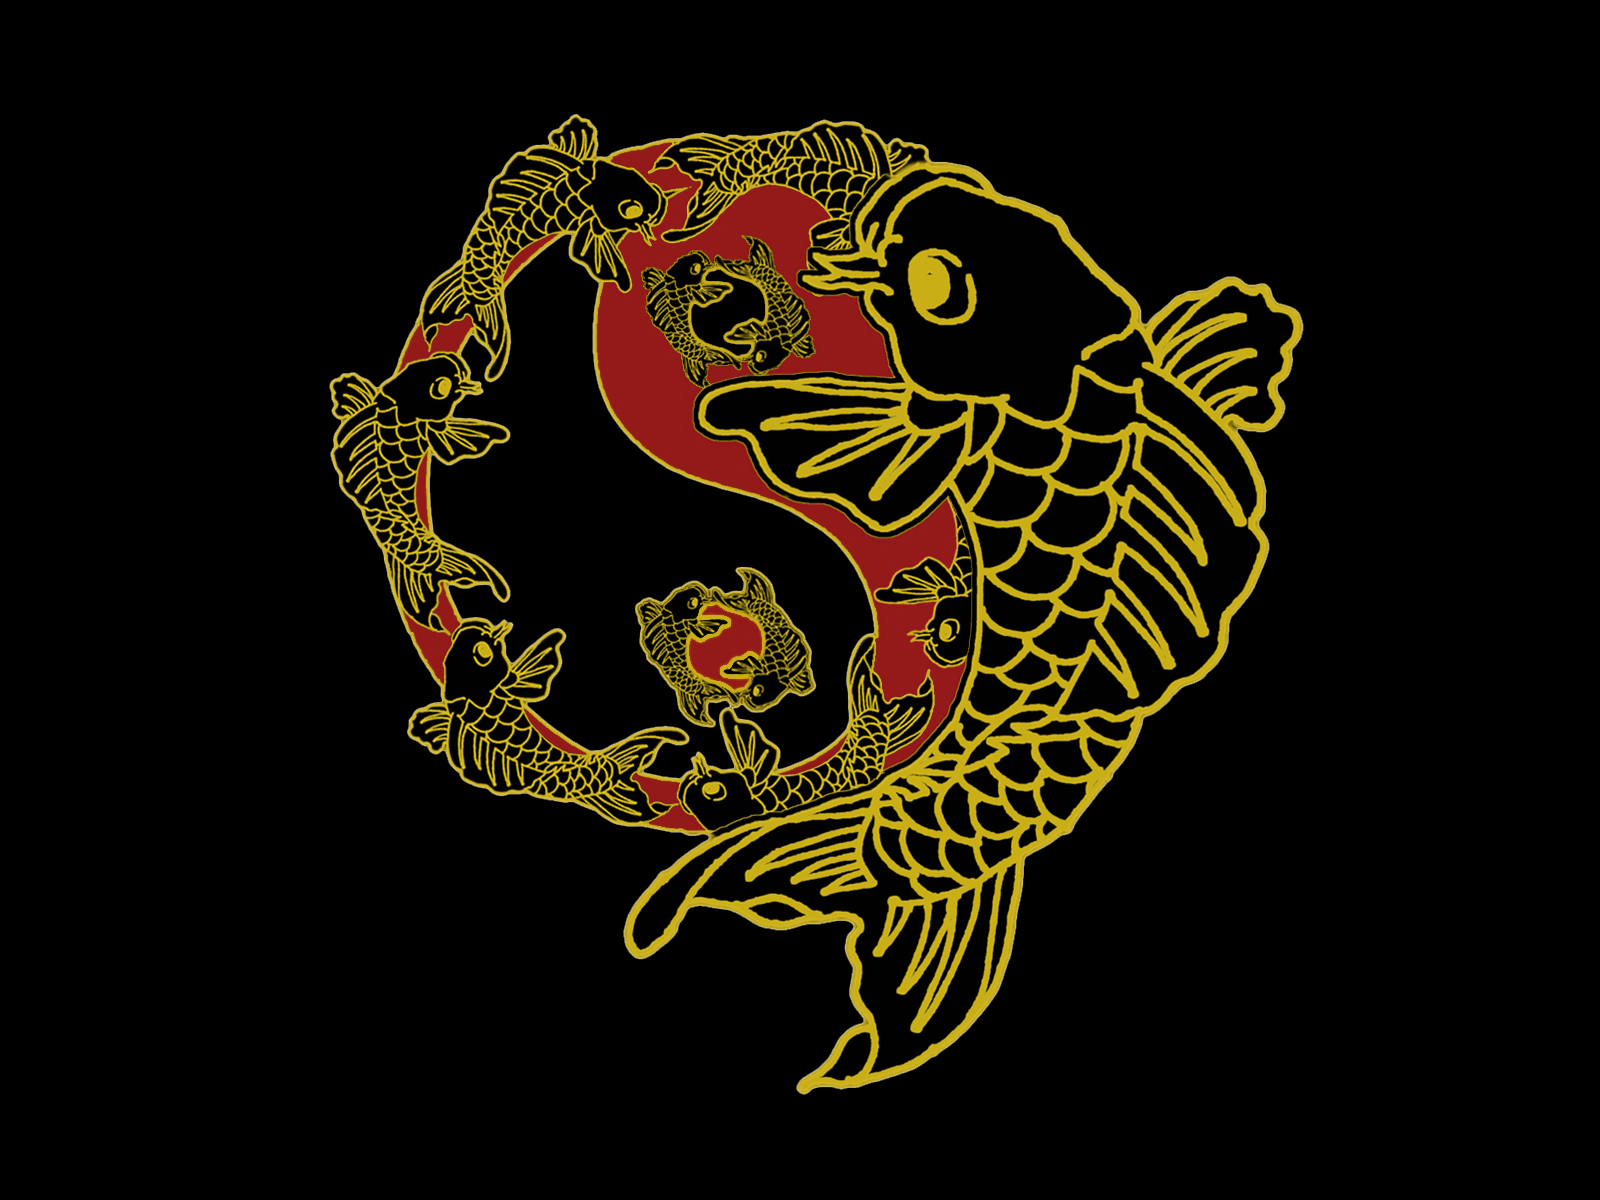 Koi N Yang Black Yin By Smoothraven7 On Deviantart